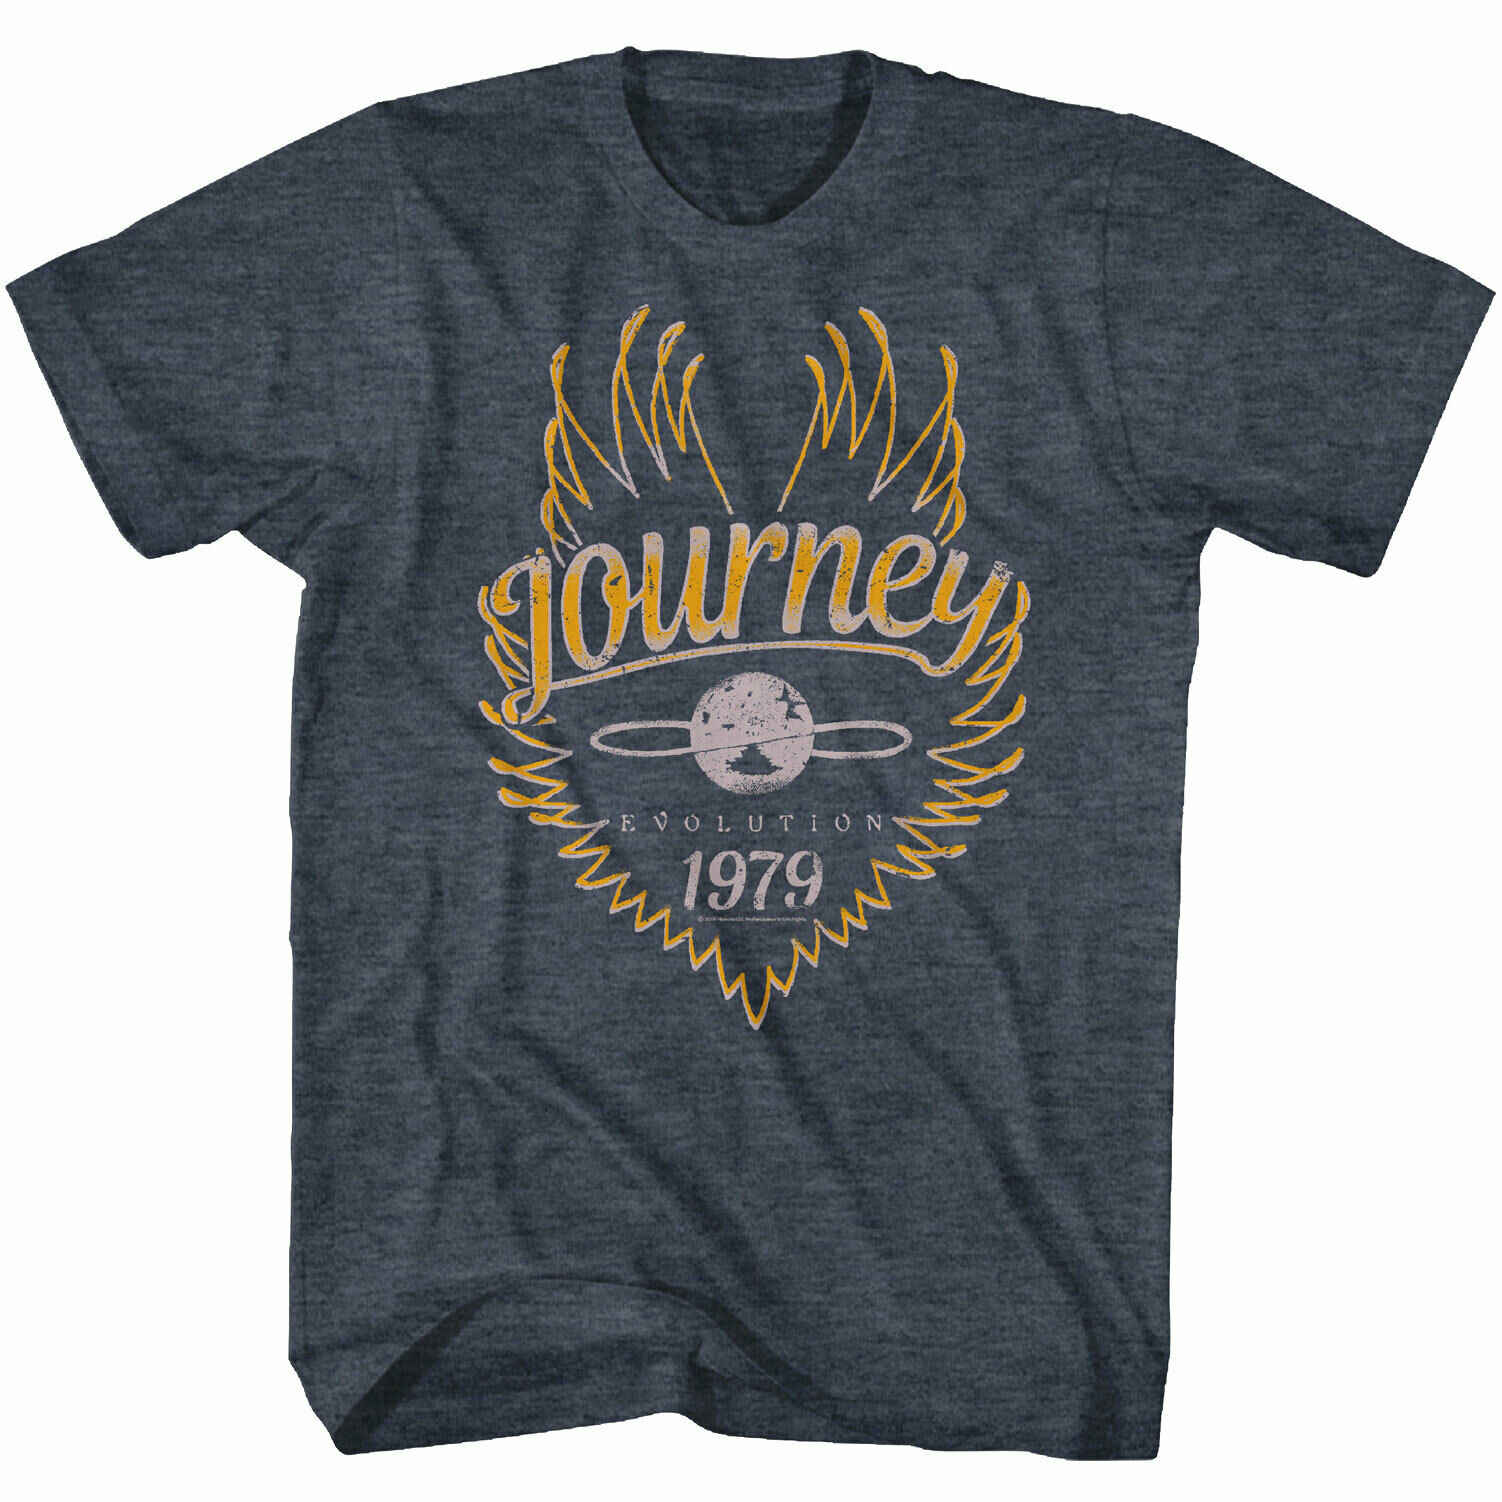 Journey Evolution Tour 1979 Мужская футболка рок-группа винтажная концертная музыка Merch Nicki Minaj футболка Billie Eilish